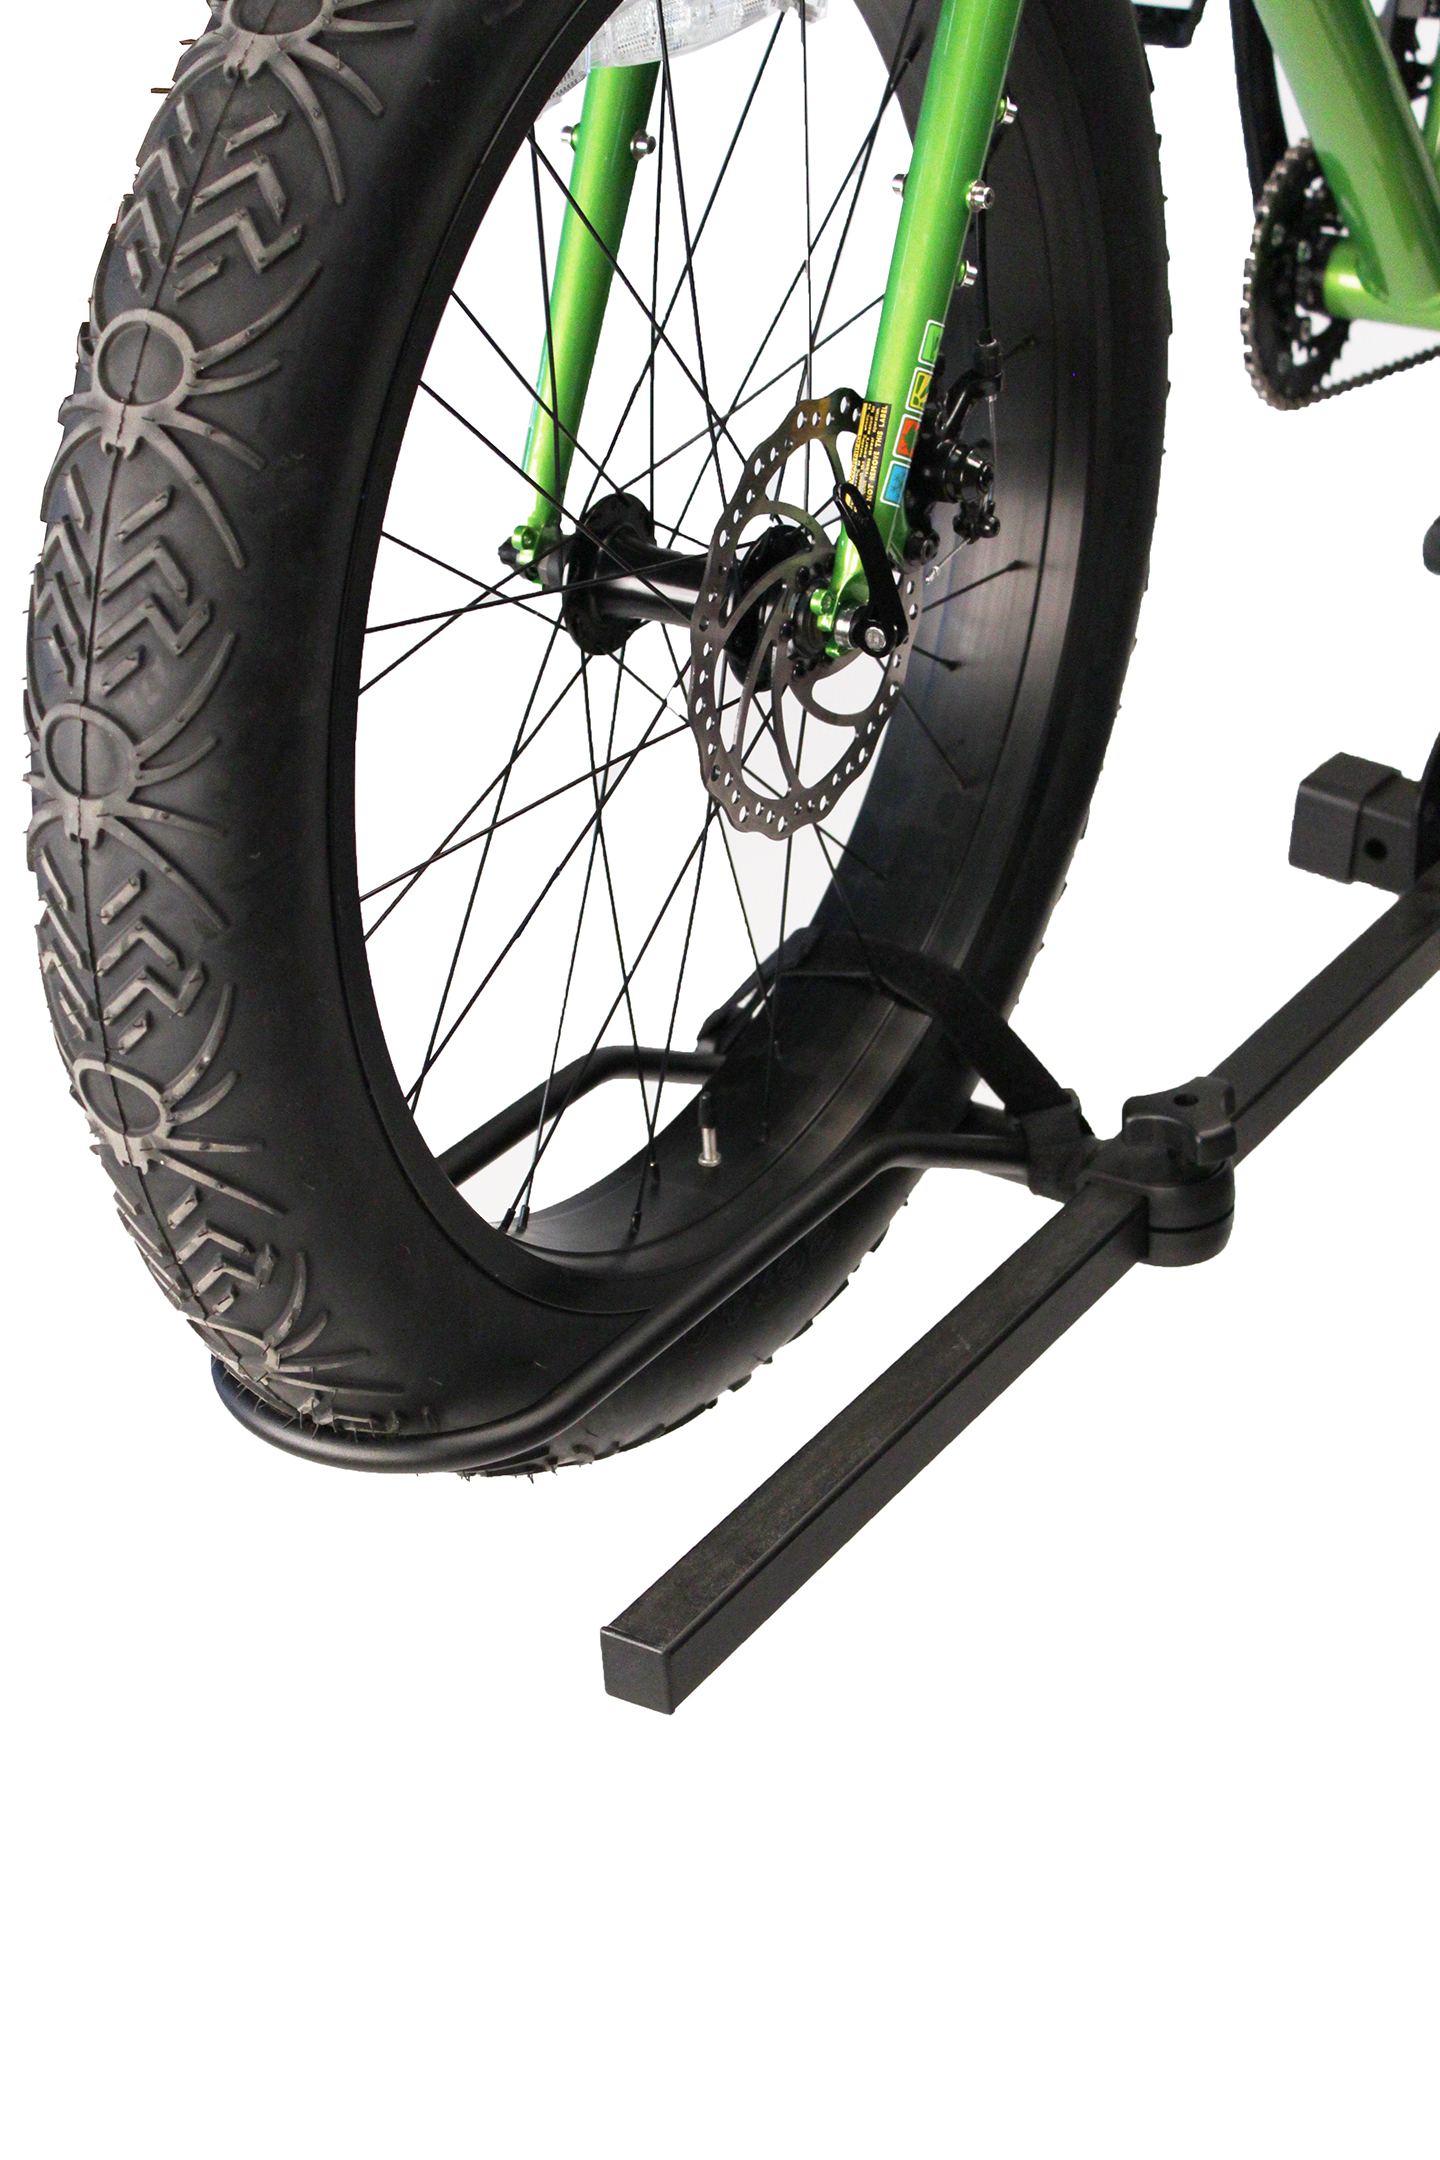 Hollywood Racks Fat Tire Wheel Holders